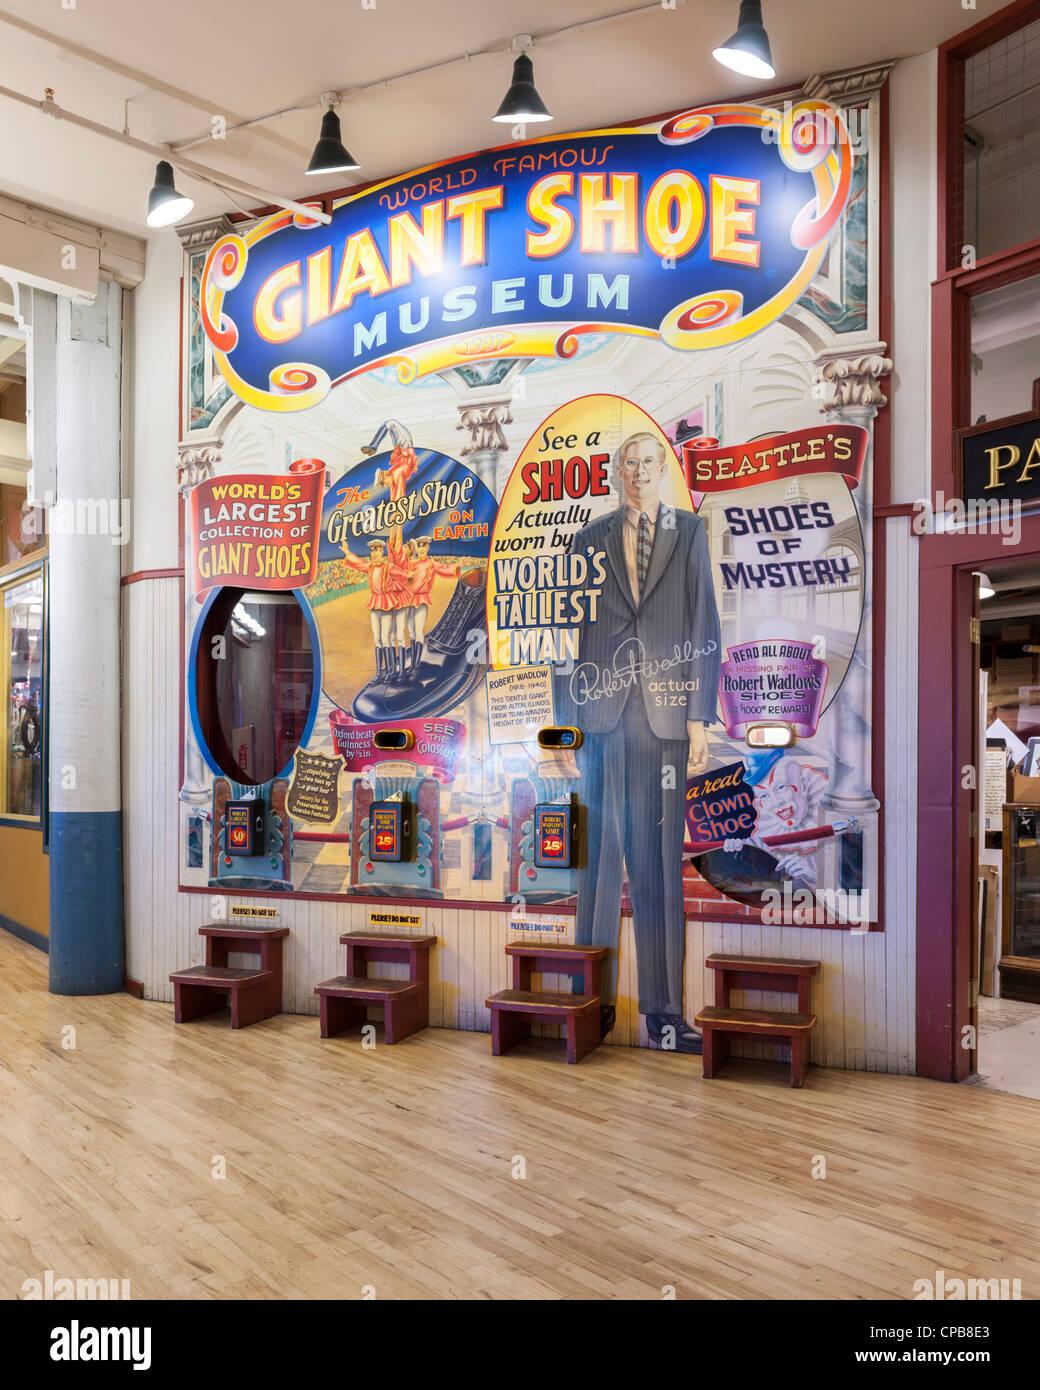 Giant Shoe Musuem Pike Place public farmers Market Seattle - Stock Image